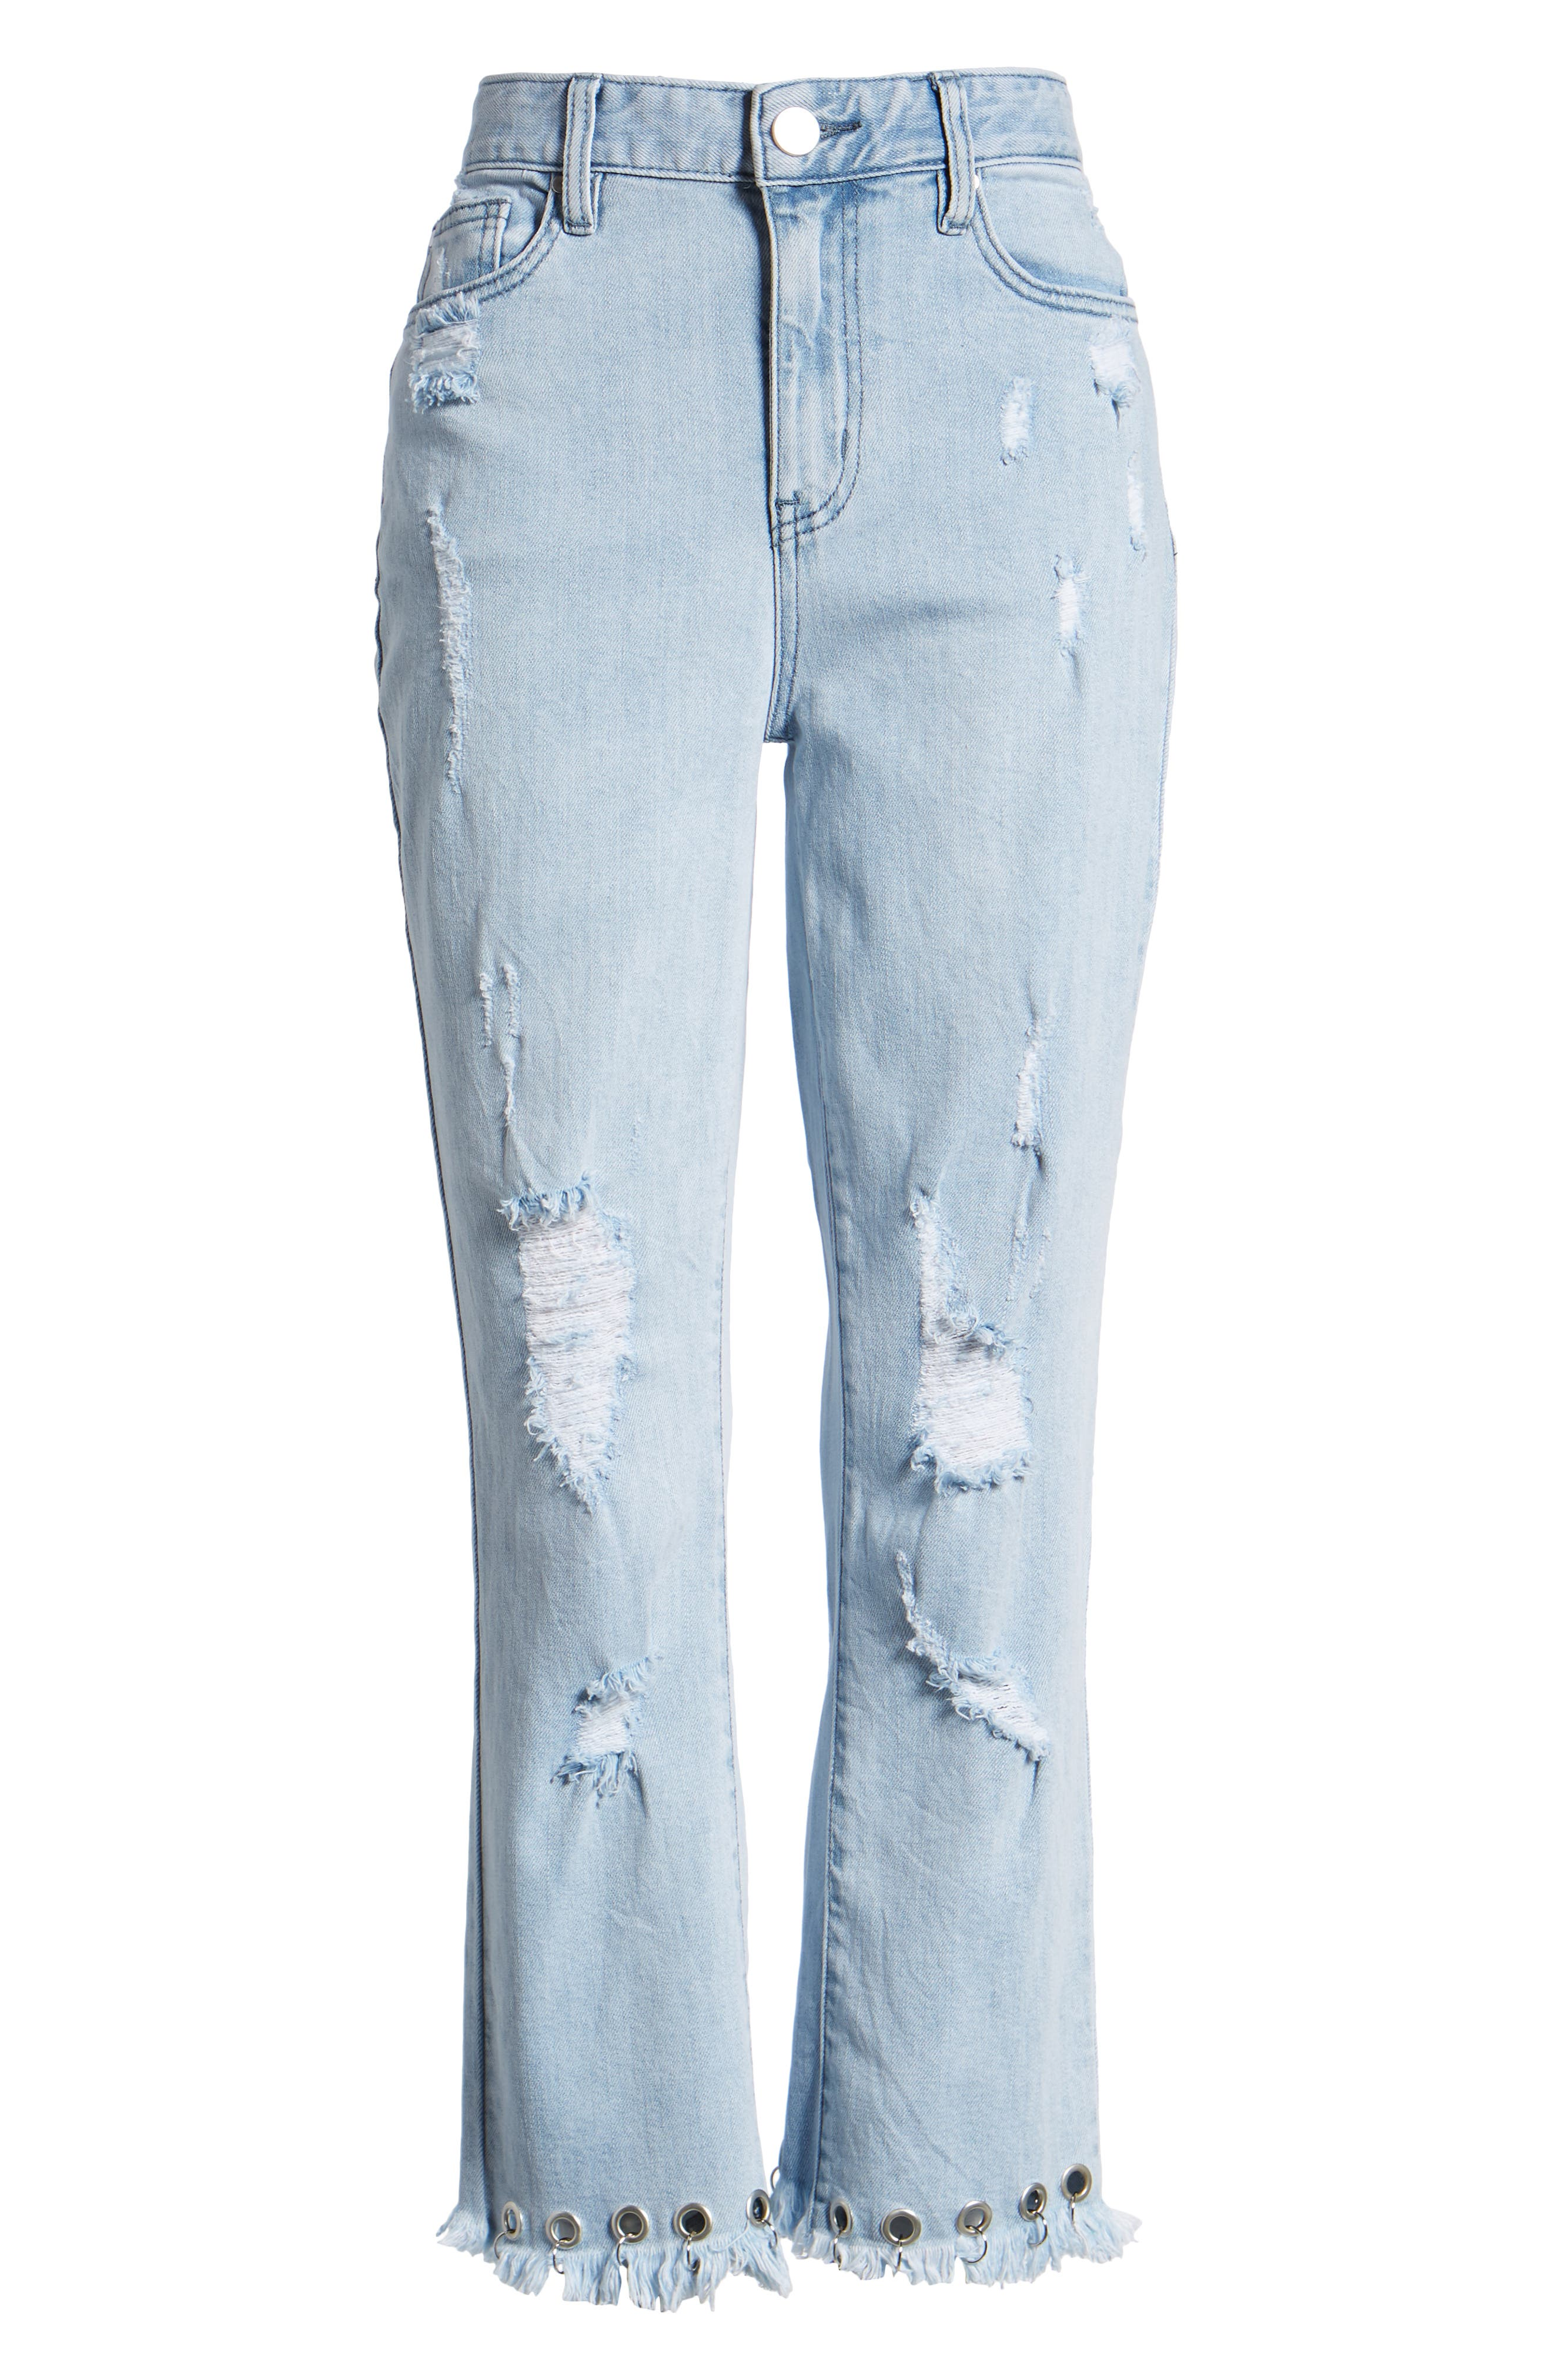 Grommet Hem Distressed Crop Jeans,                             Alternate thumbnail 7, color,                             Light Wash